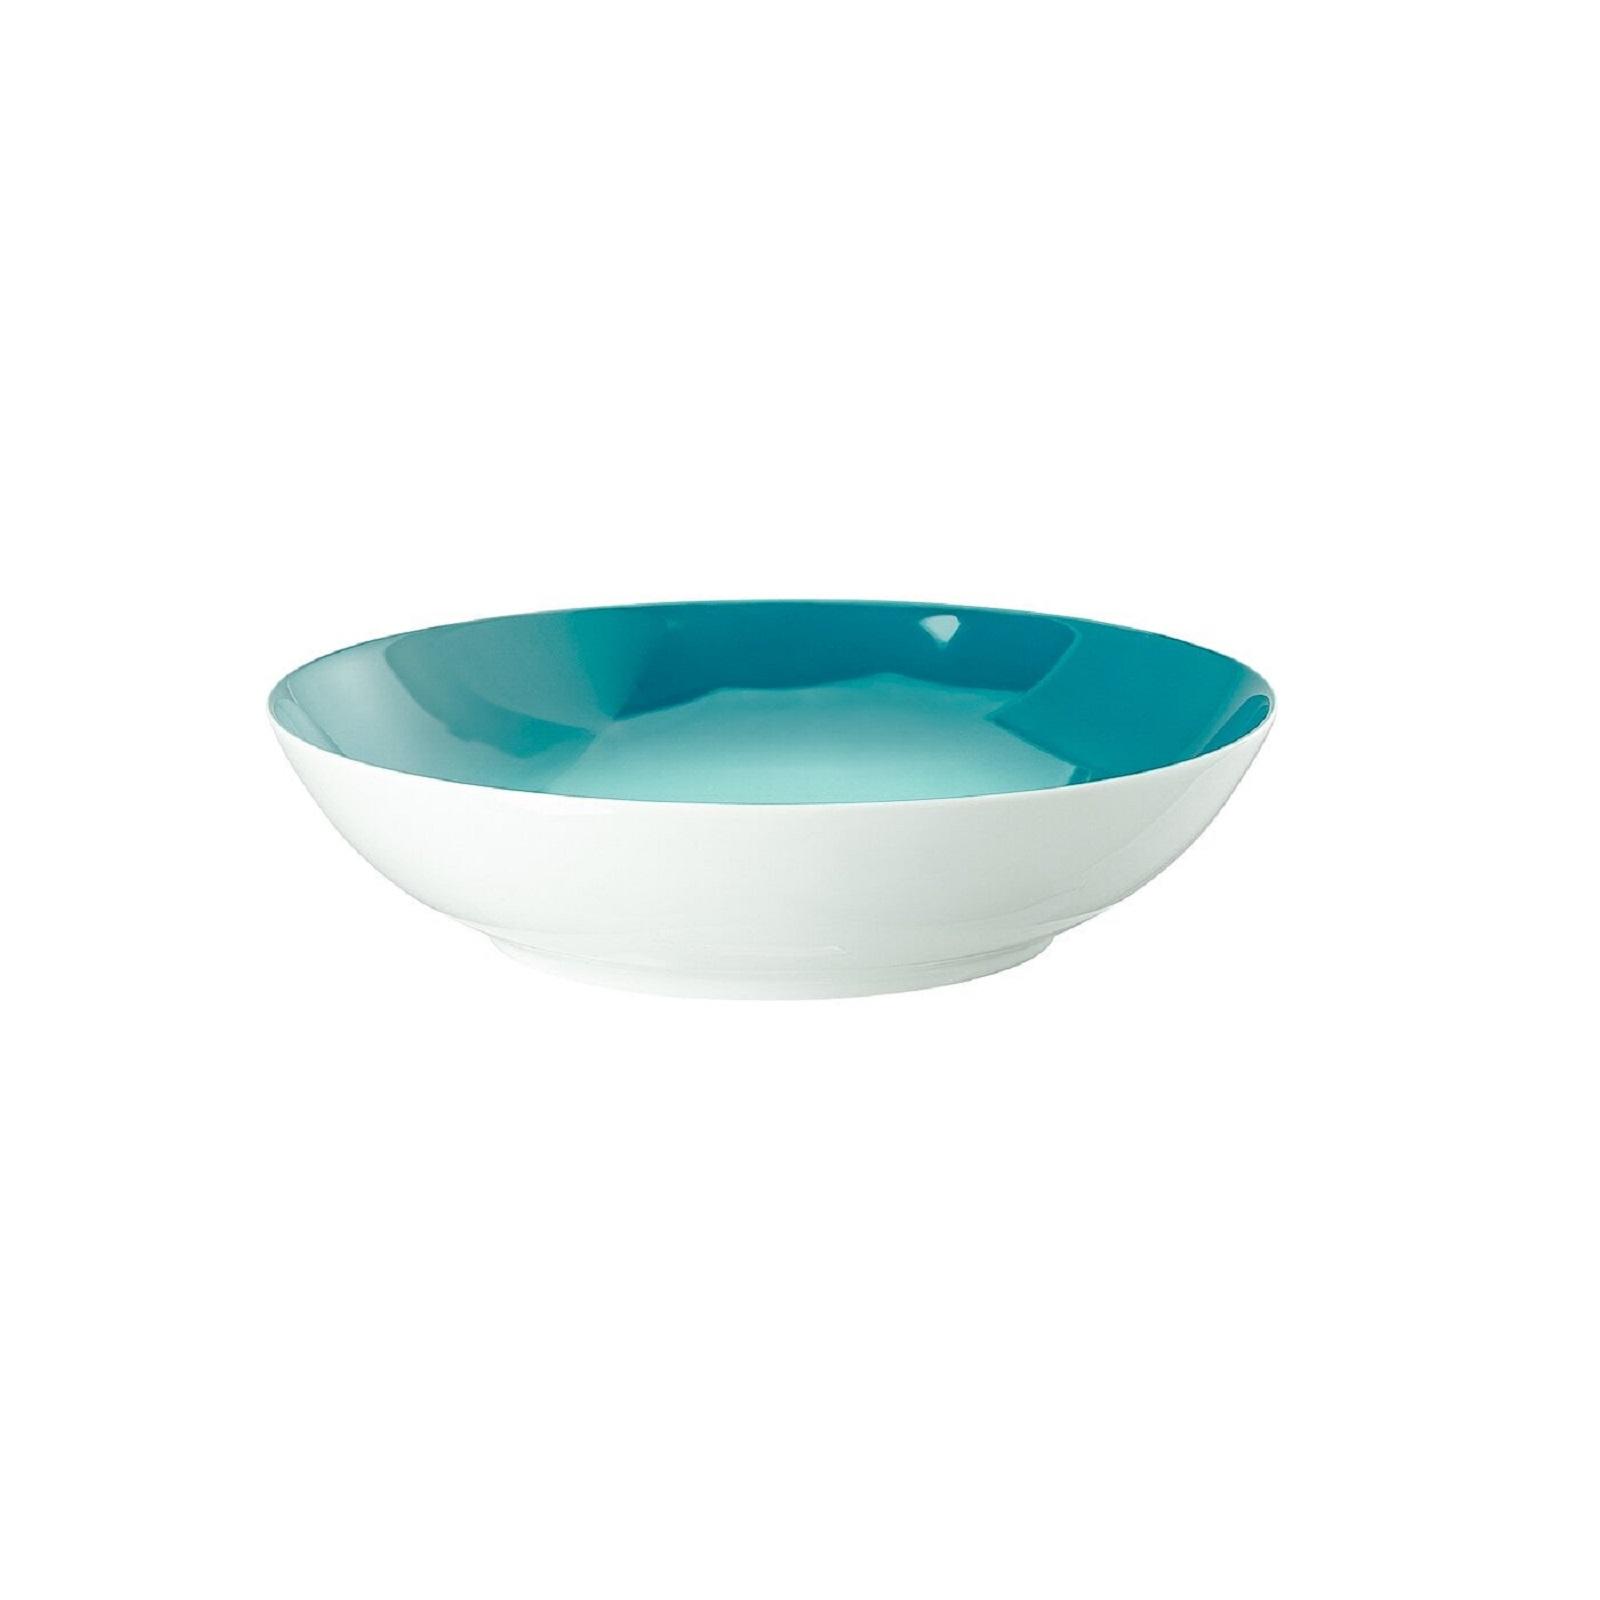 Тарелка глубокая фарфоровая Rosenthal Thomas BECOLOUR, диаметр 22 см, синий Rosenthal 10700-408729-10322 фото 1